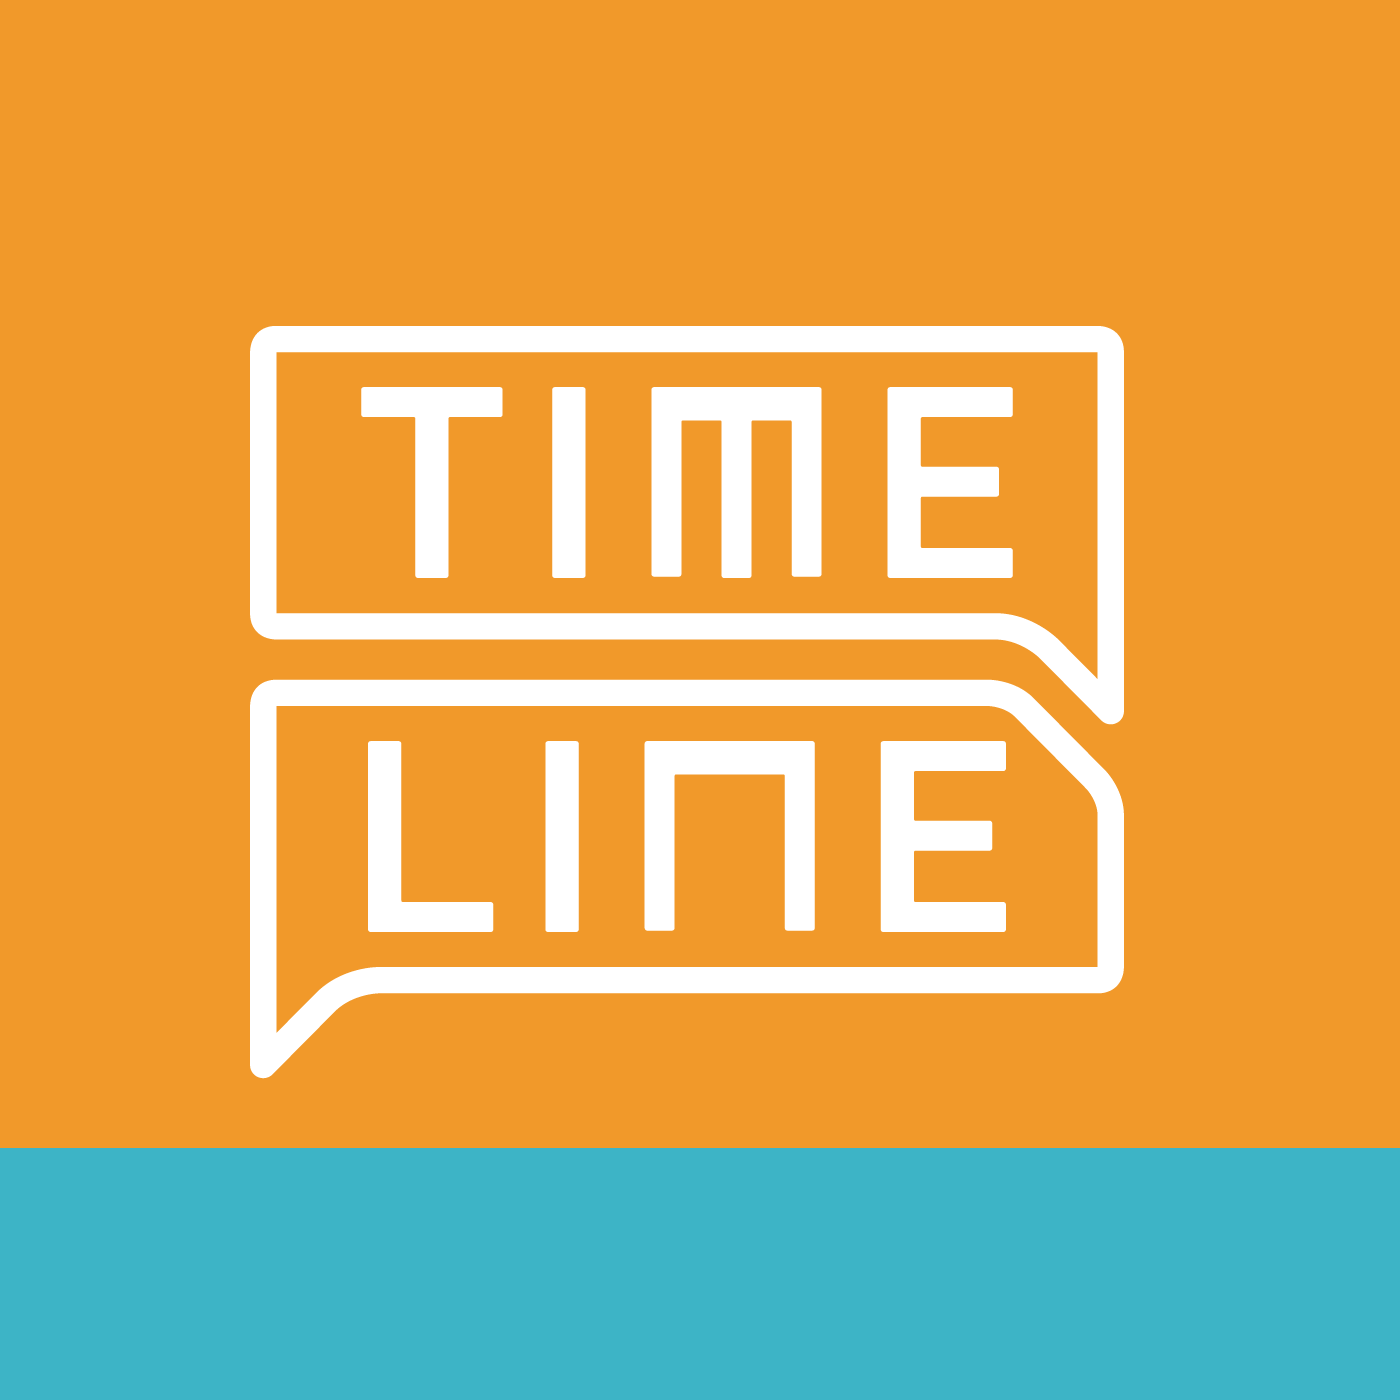 Timeline Ga�cha - 21/10/2016